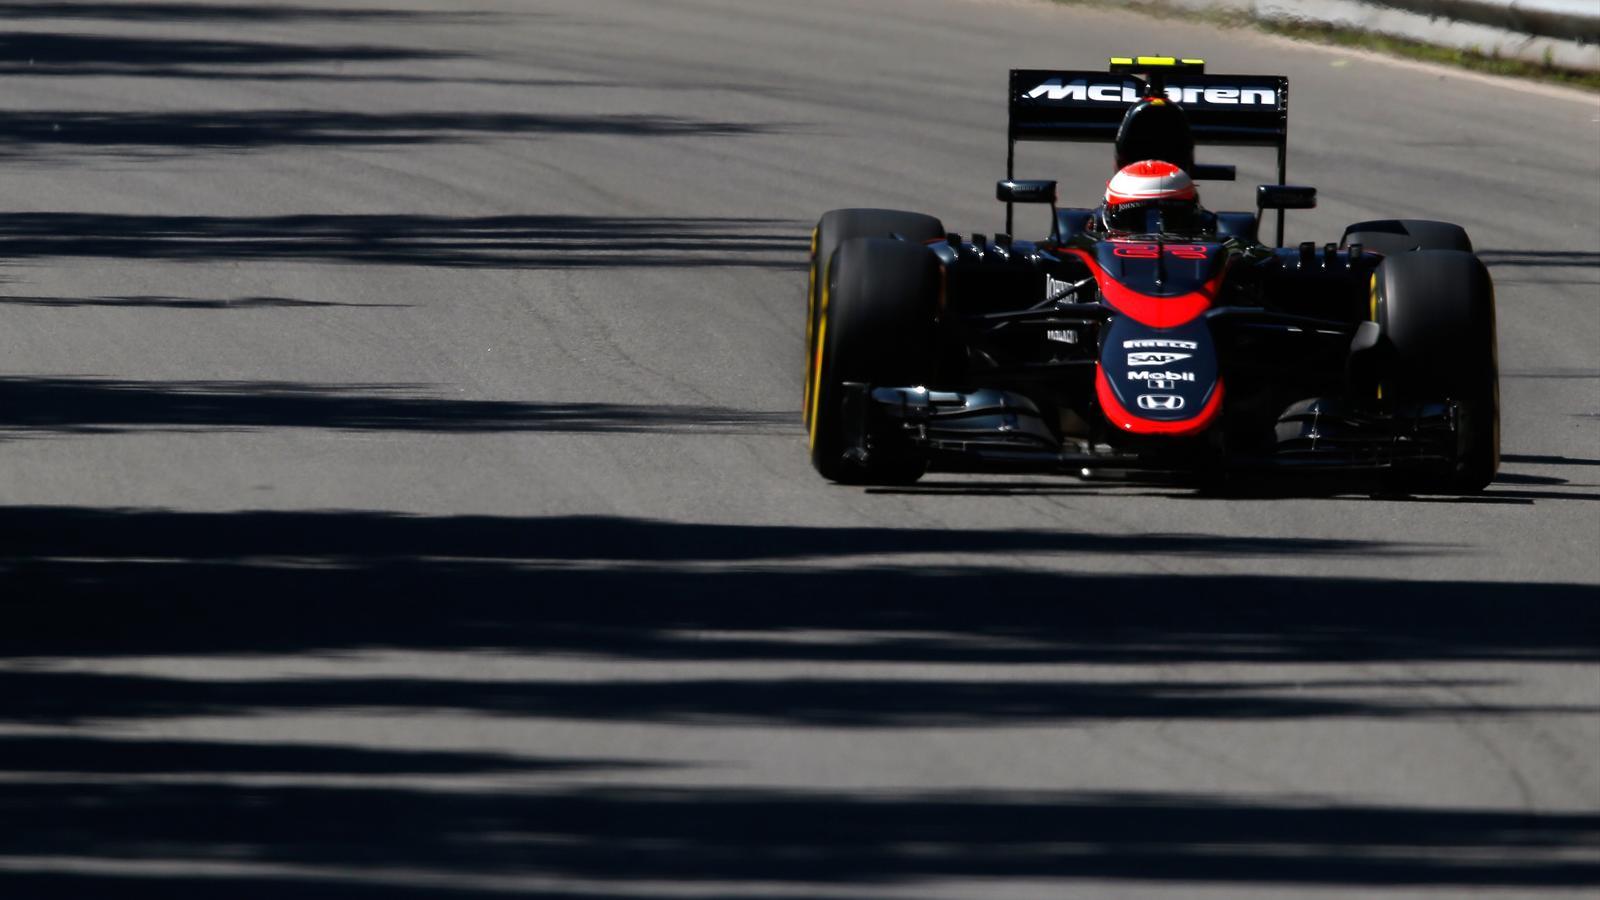 Jenson Button (McLaren) - GP of Canada 2015